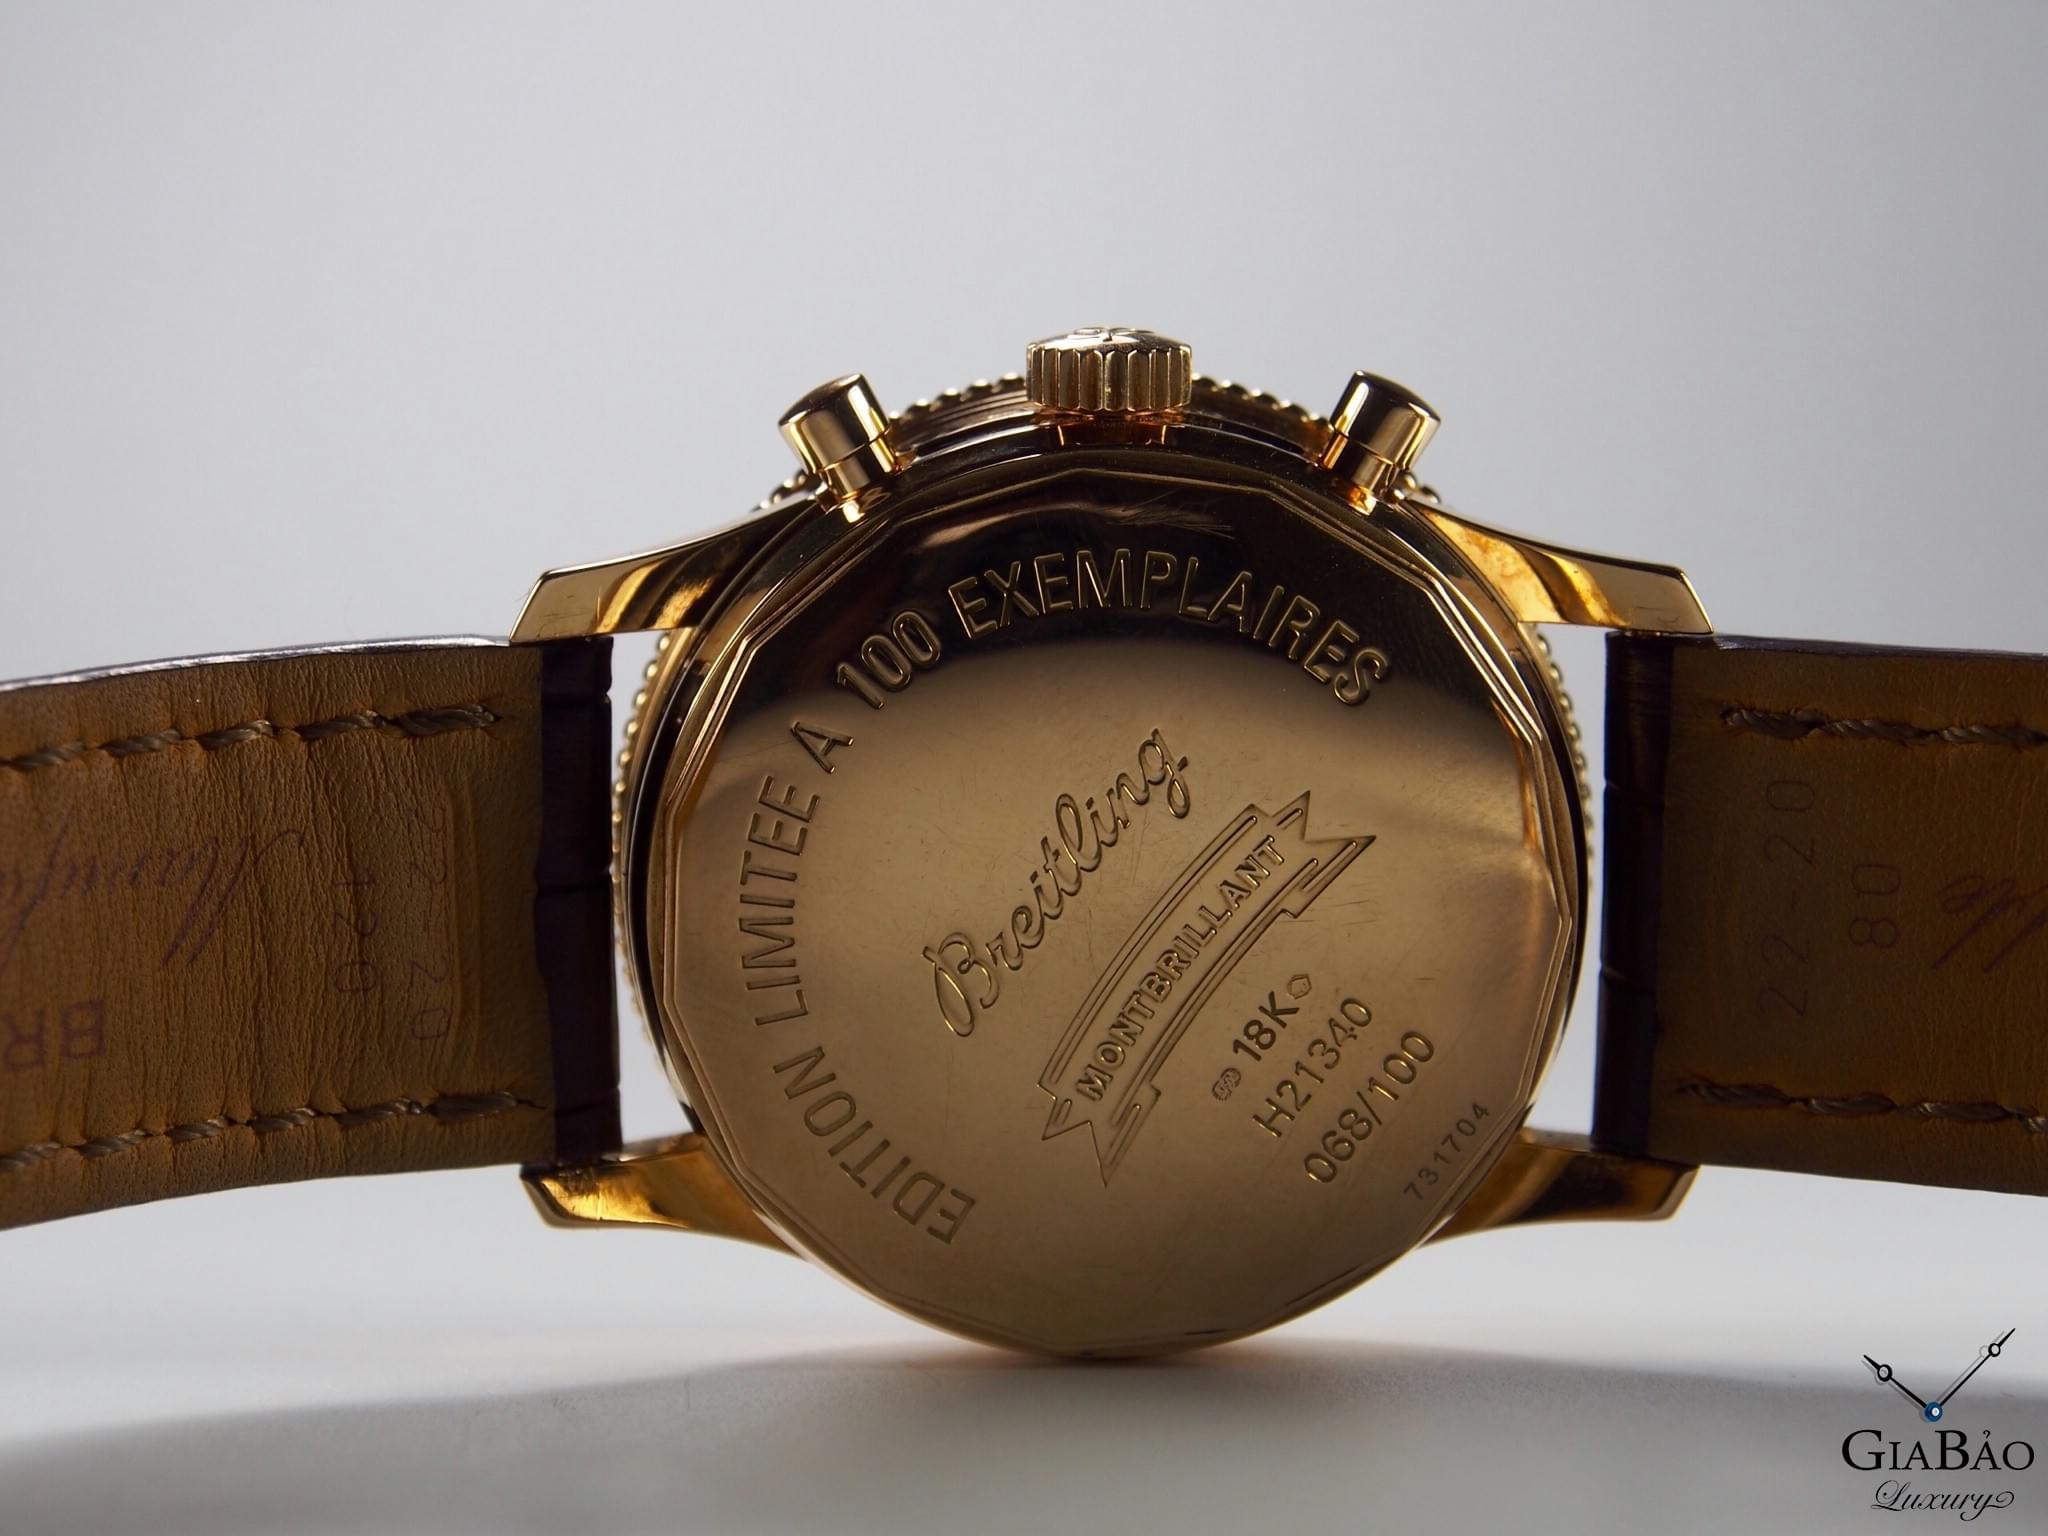 Gia bảo luxury - Đồng hồ Breitling Montbrillant